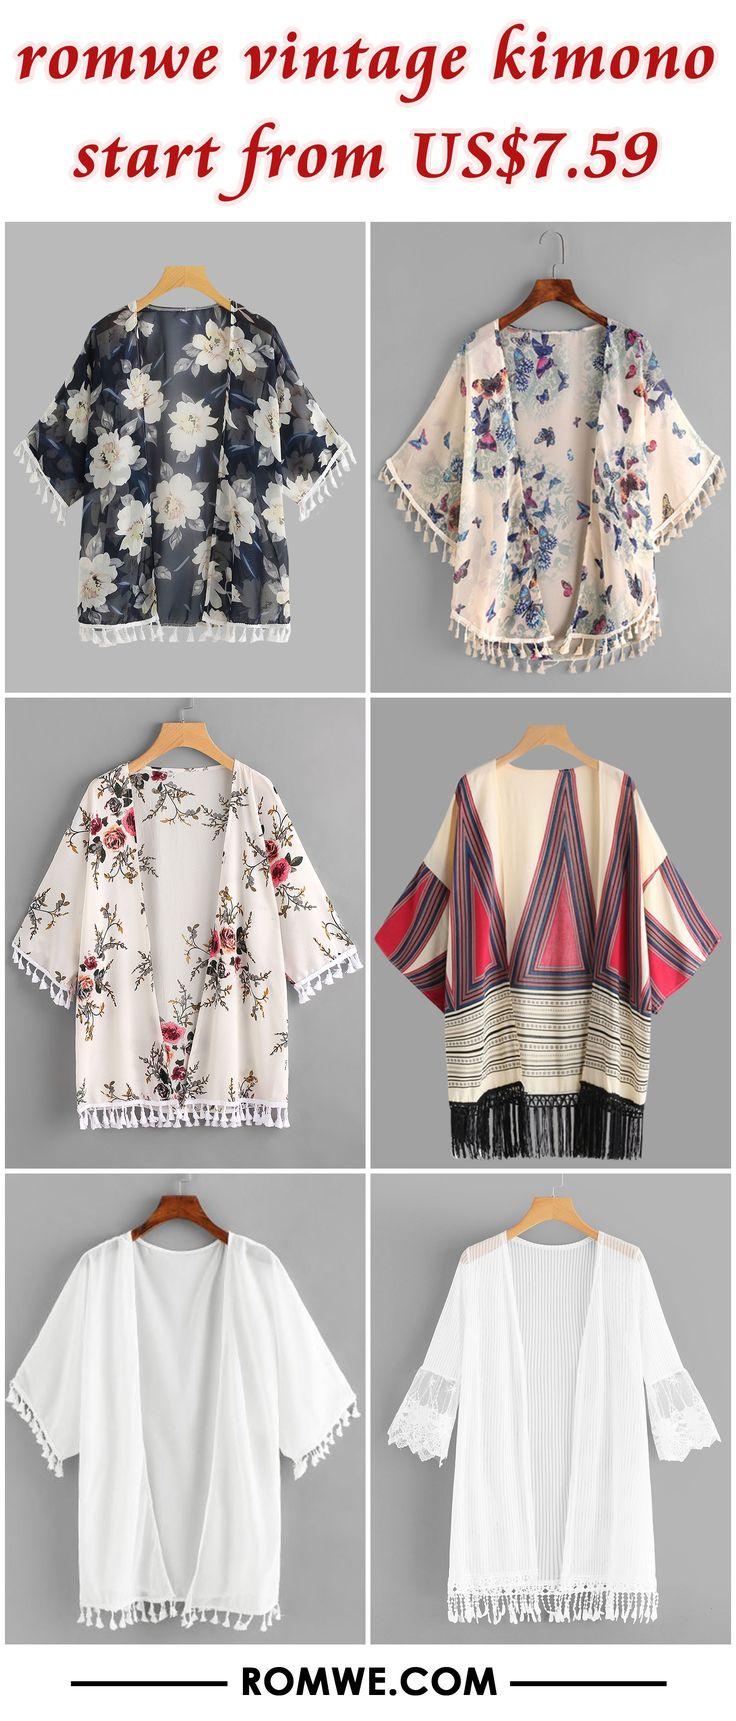 summer romwe vintage kimono